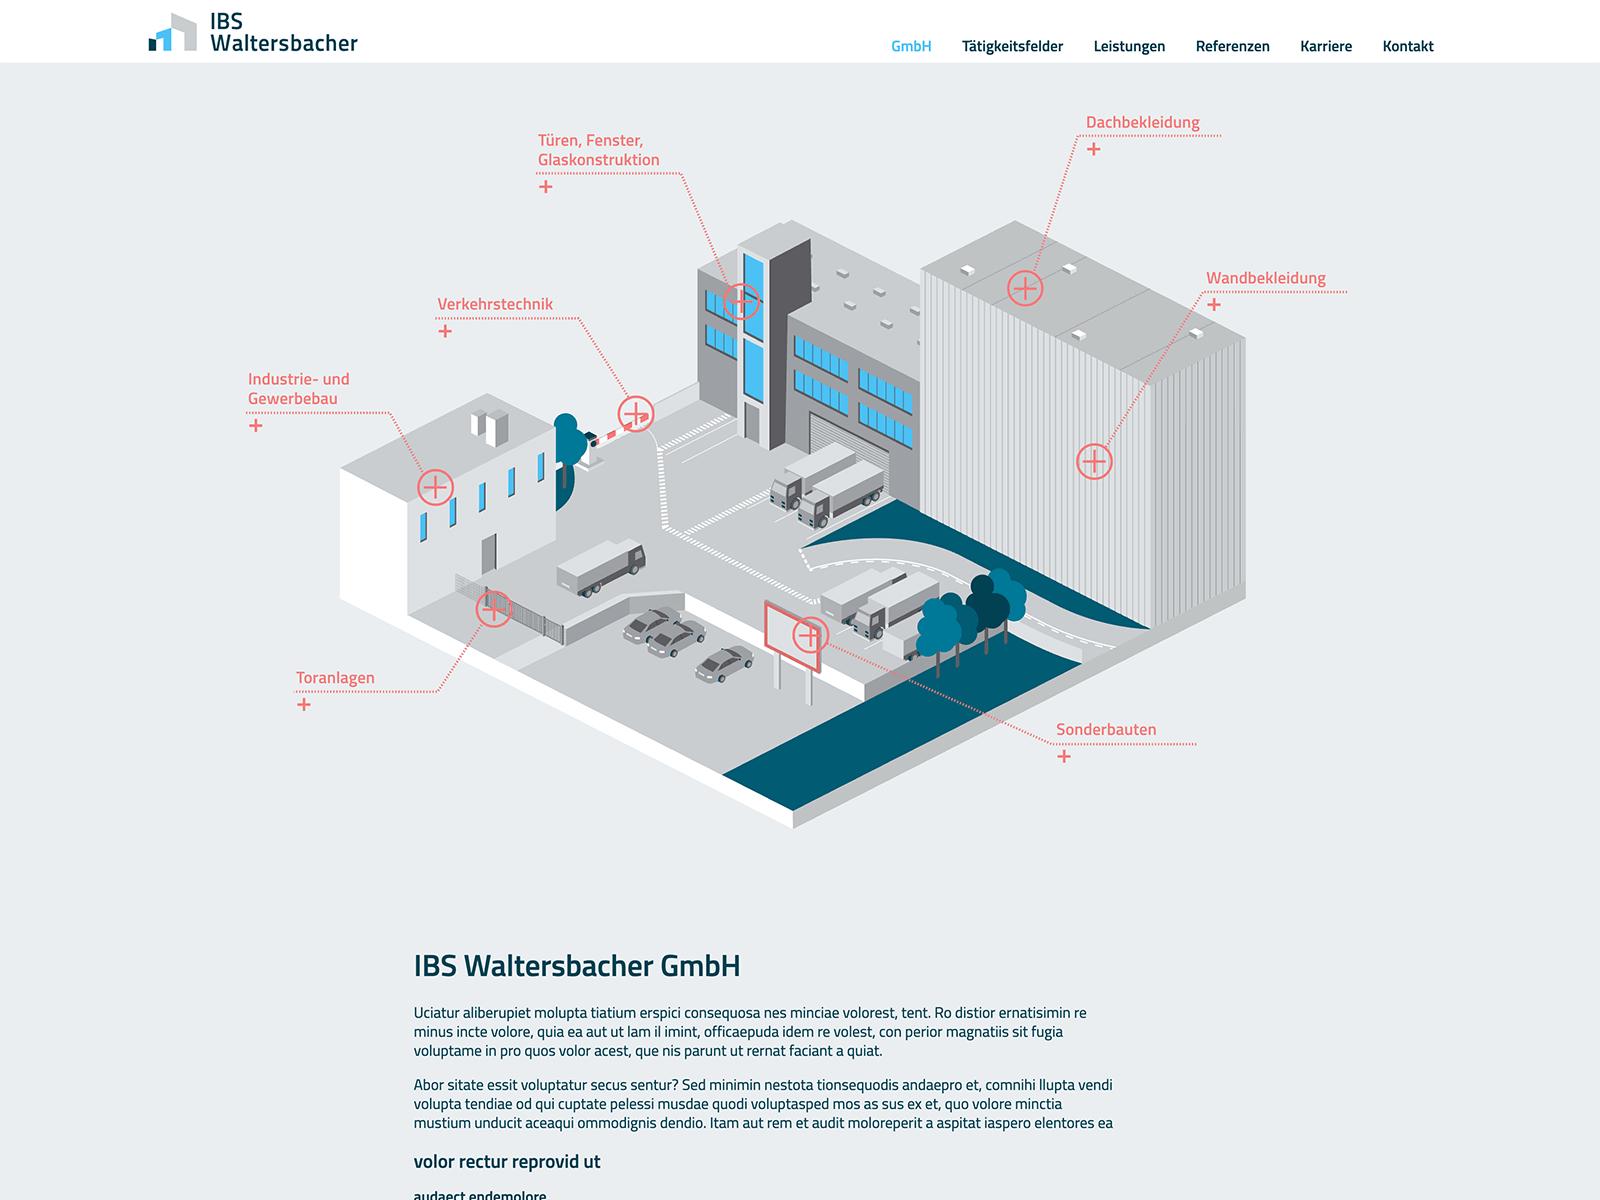 Wordpress-Entwicklung IBS Waltersbacher